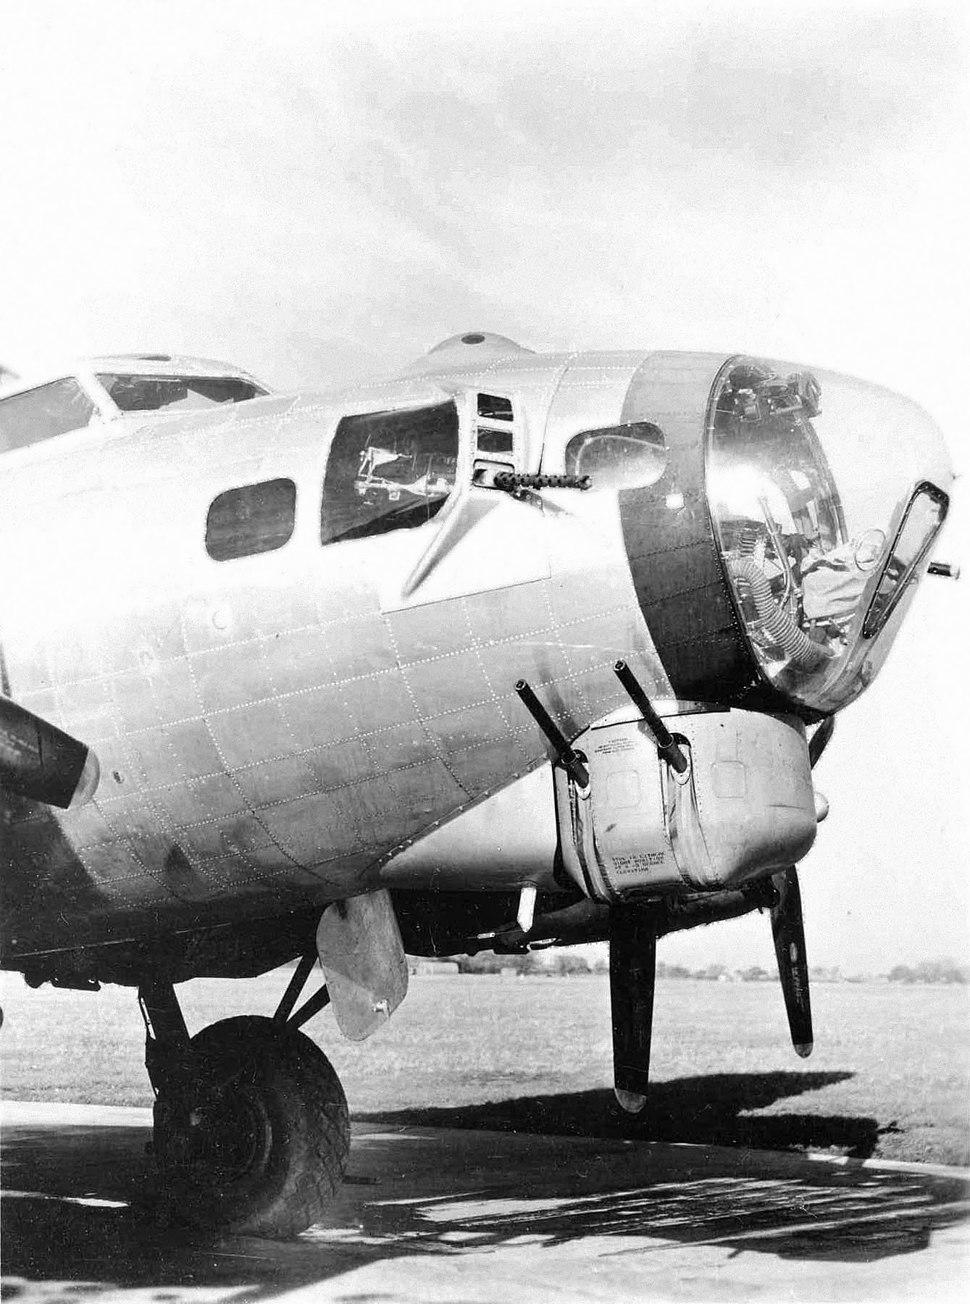 B-17G Nose in Detail